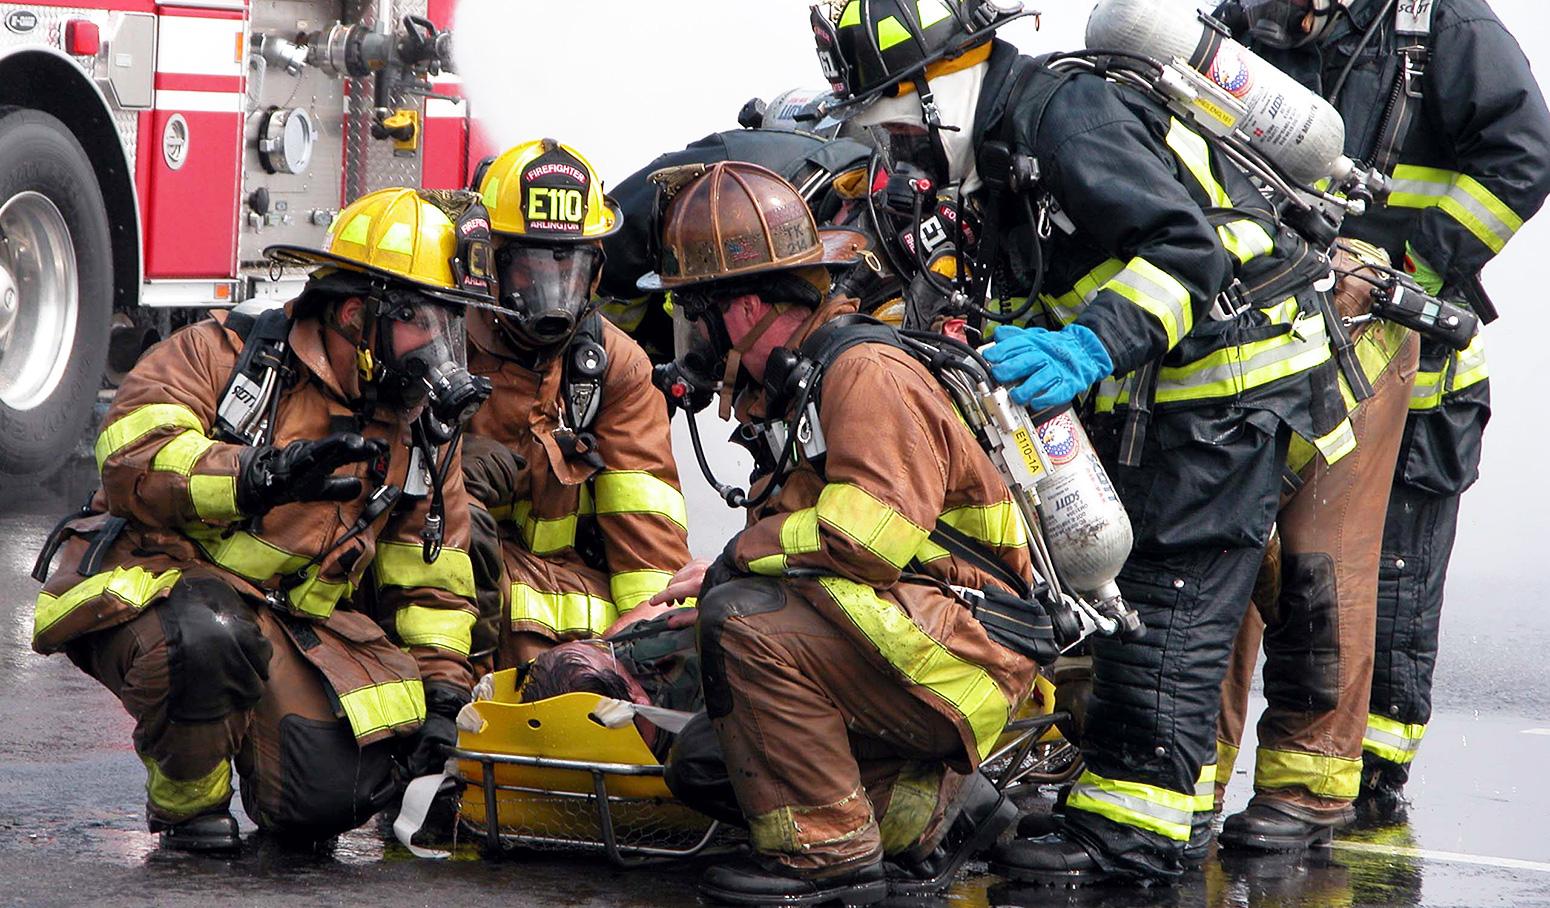 firstnet-communciations-first-responders.jpg